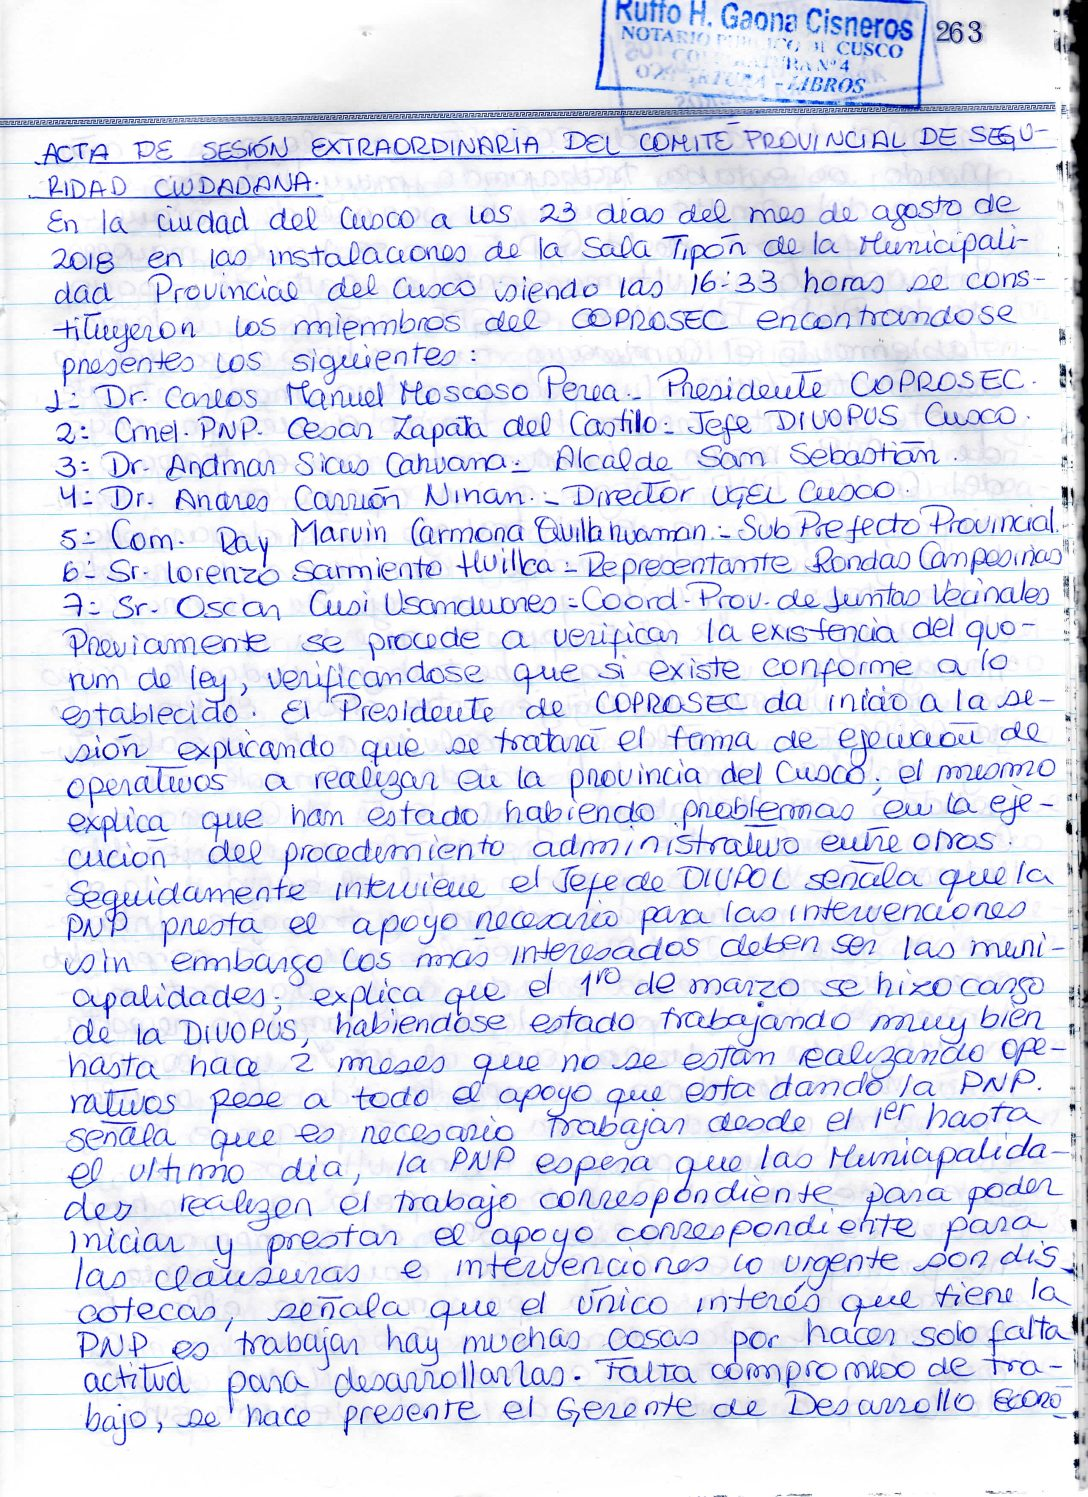 SESION EXTRAORDINARIA COPROSEC CUSCO AGOSTO 2018